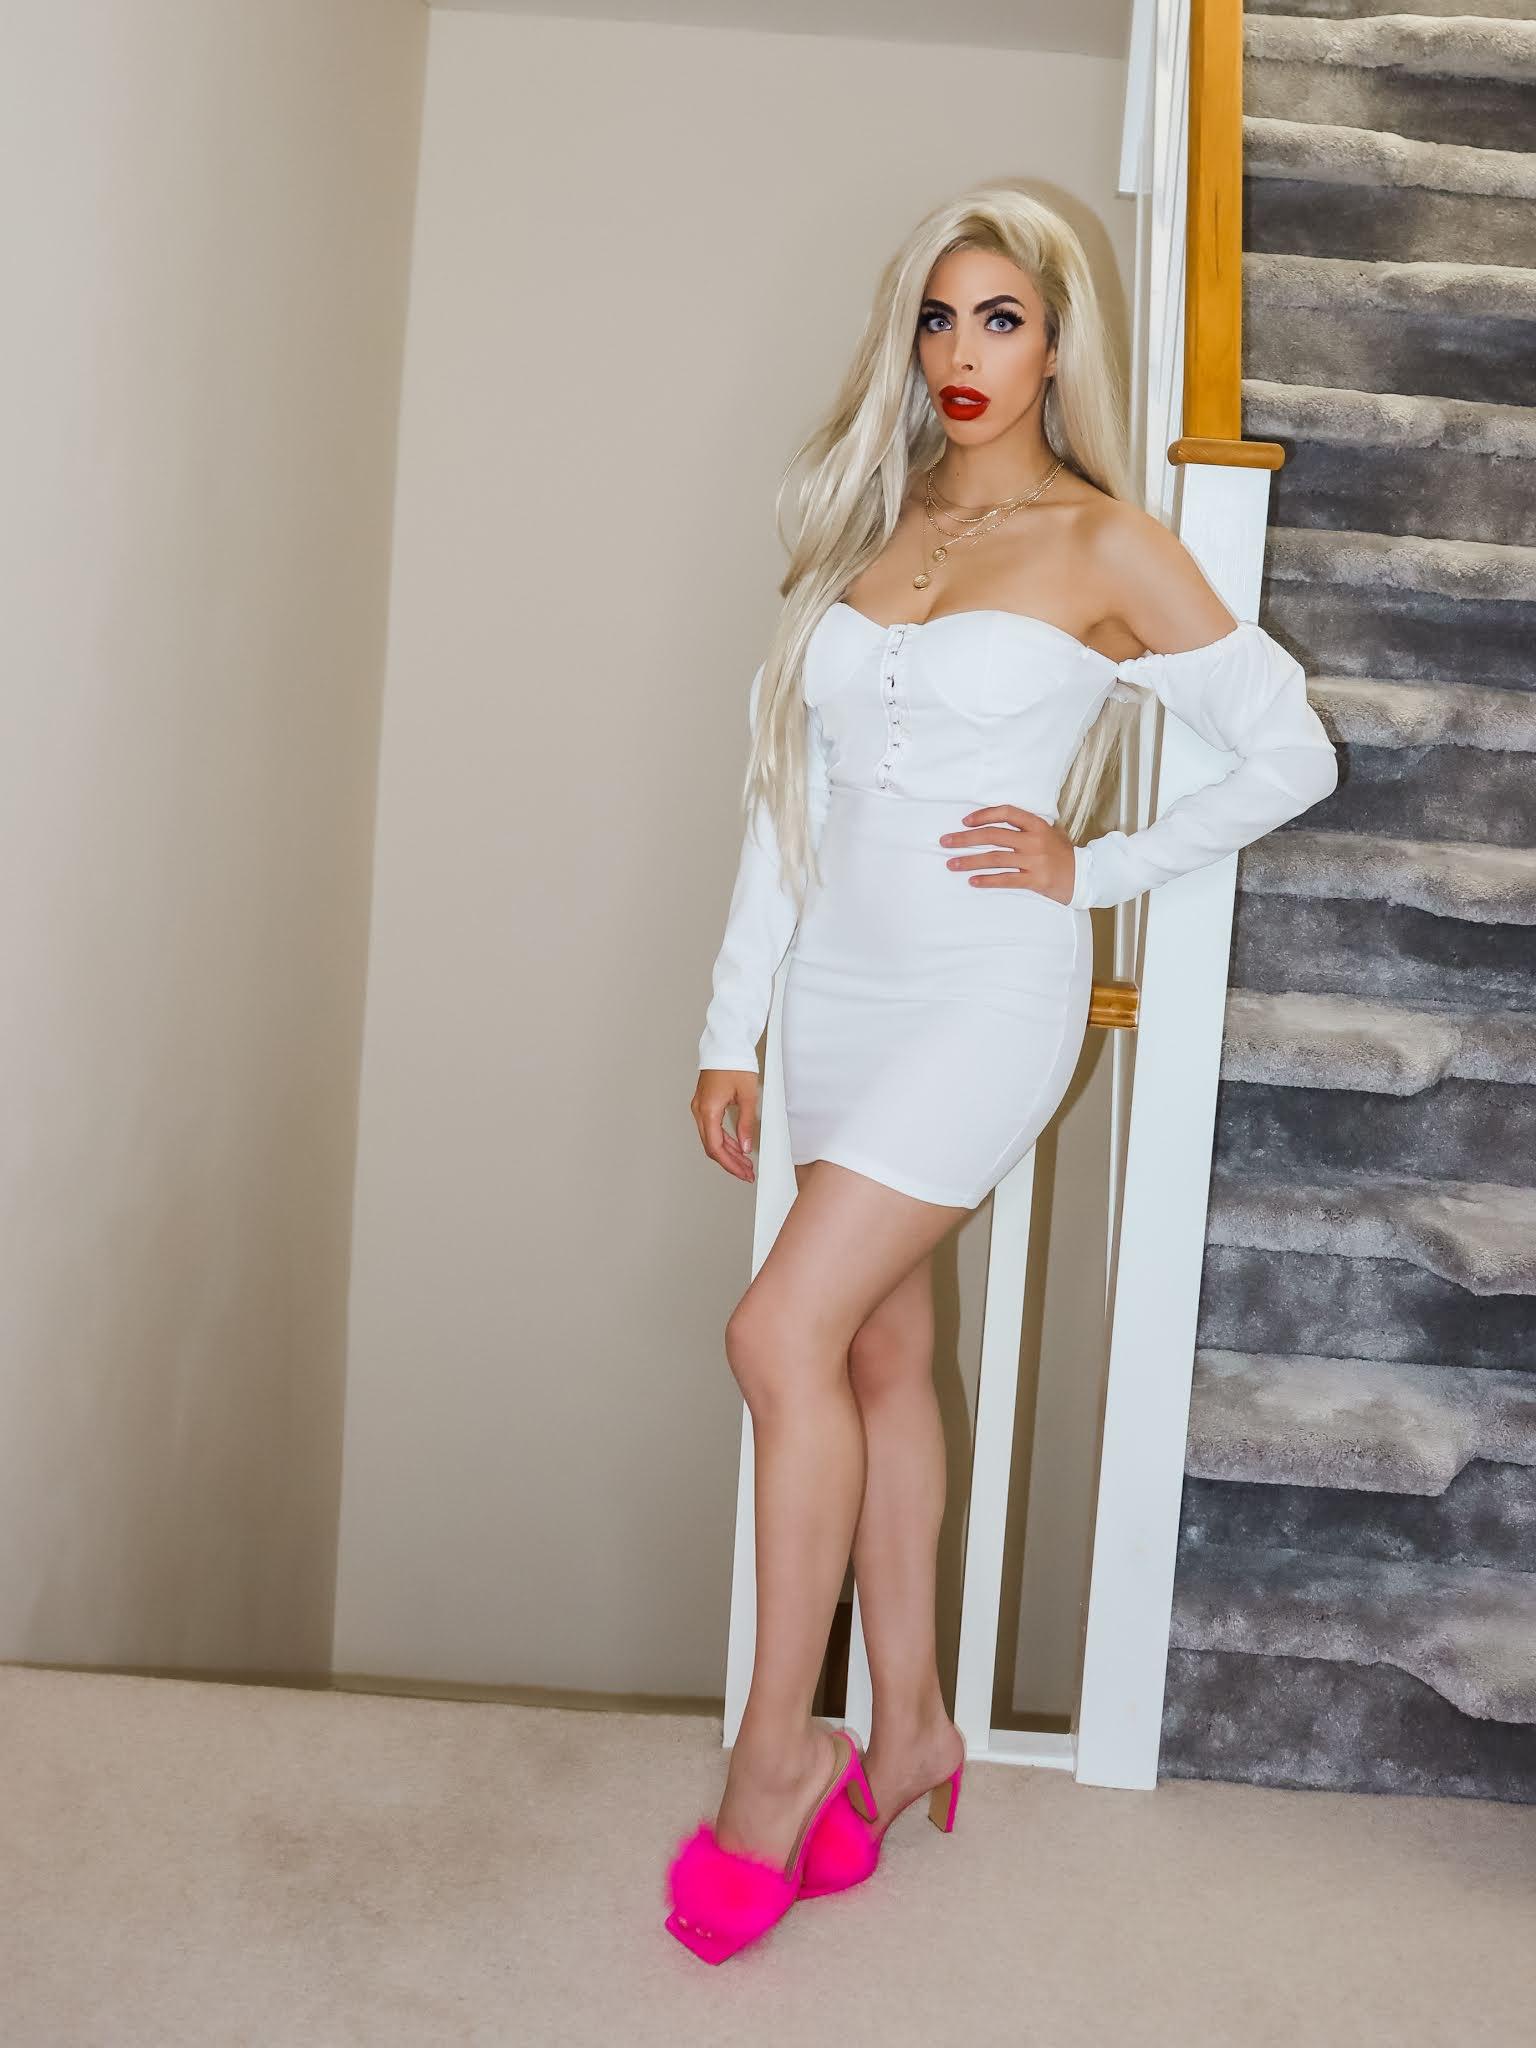 The Femme Luxe White Milkmaid Bodycon Mini Dress in model Elettra